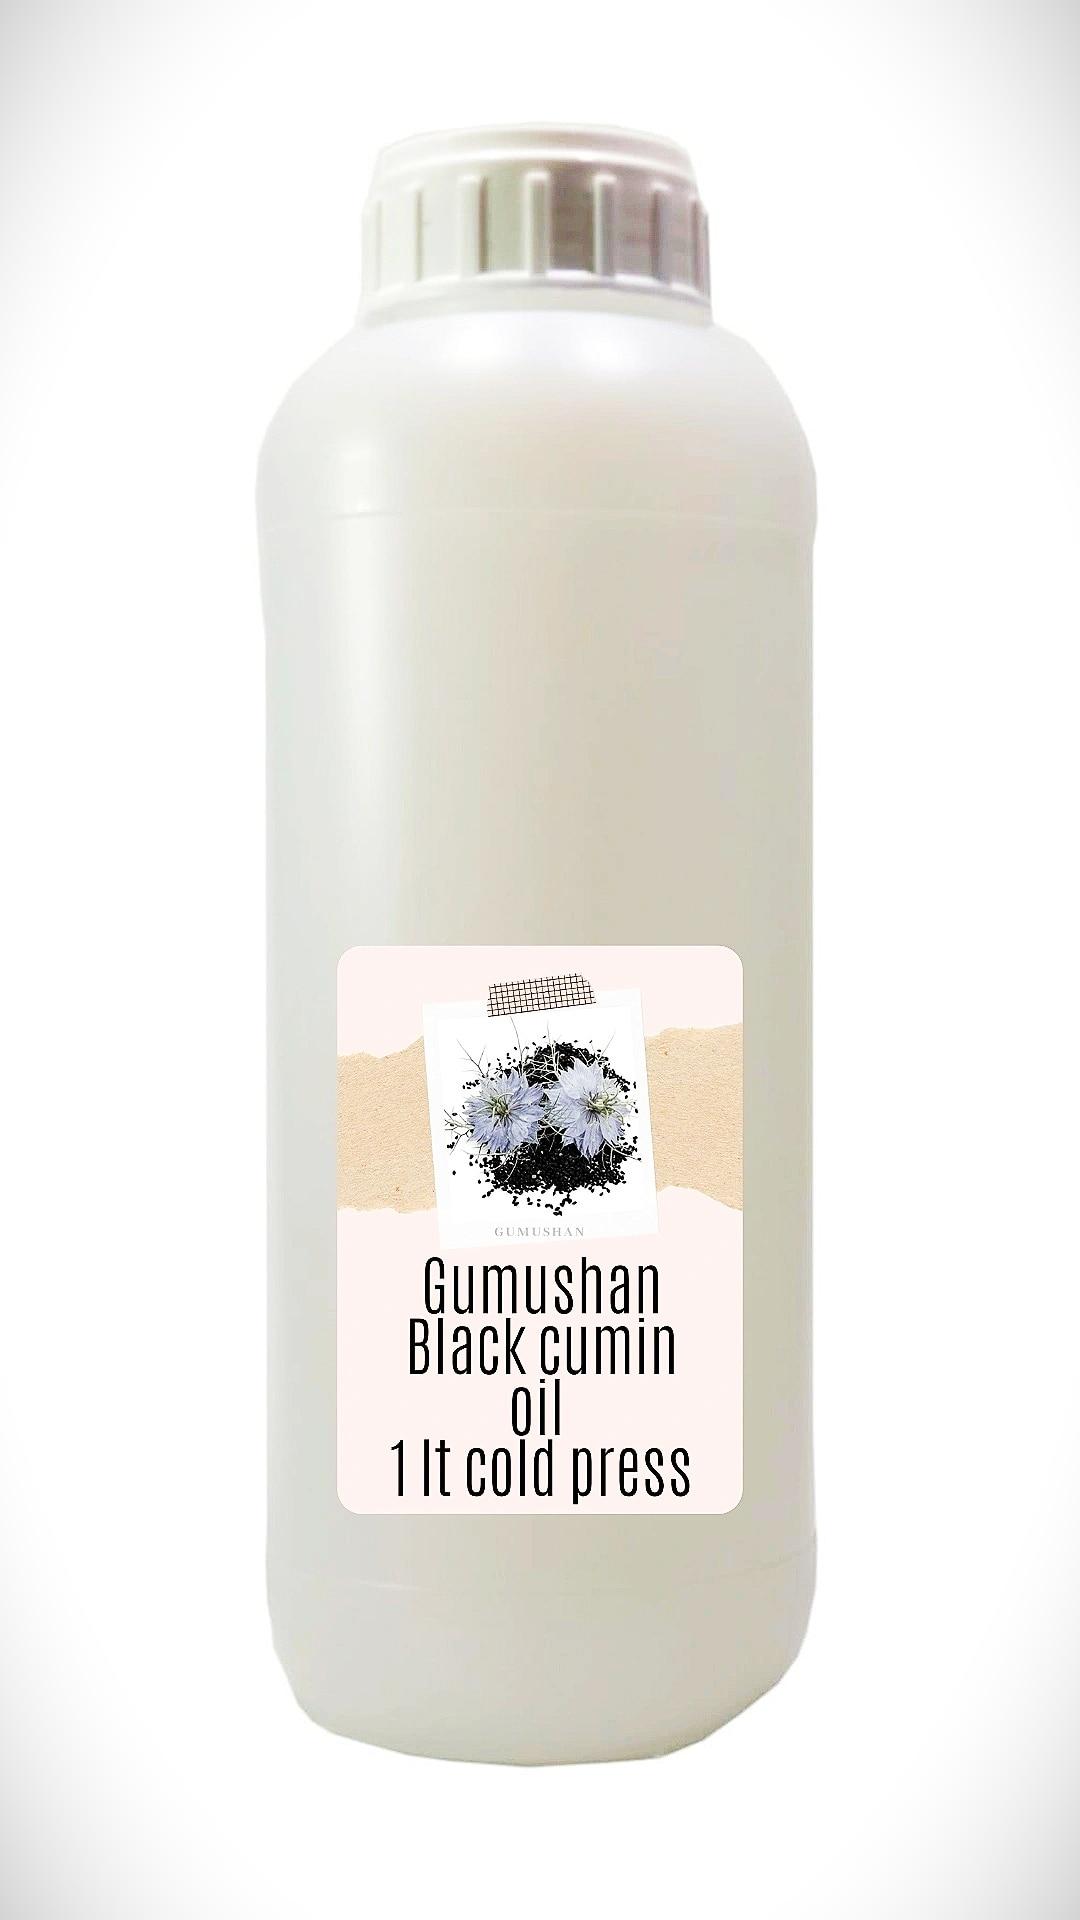 High quality pure Black Cumin Seed Oil 1 liter 34 fl oz 1000ml